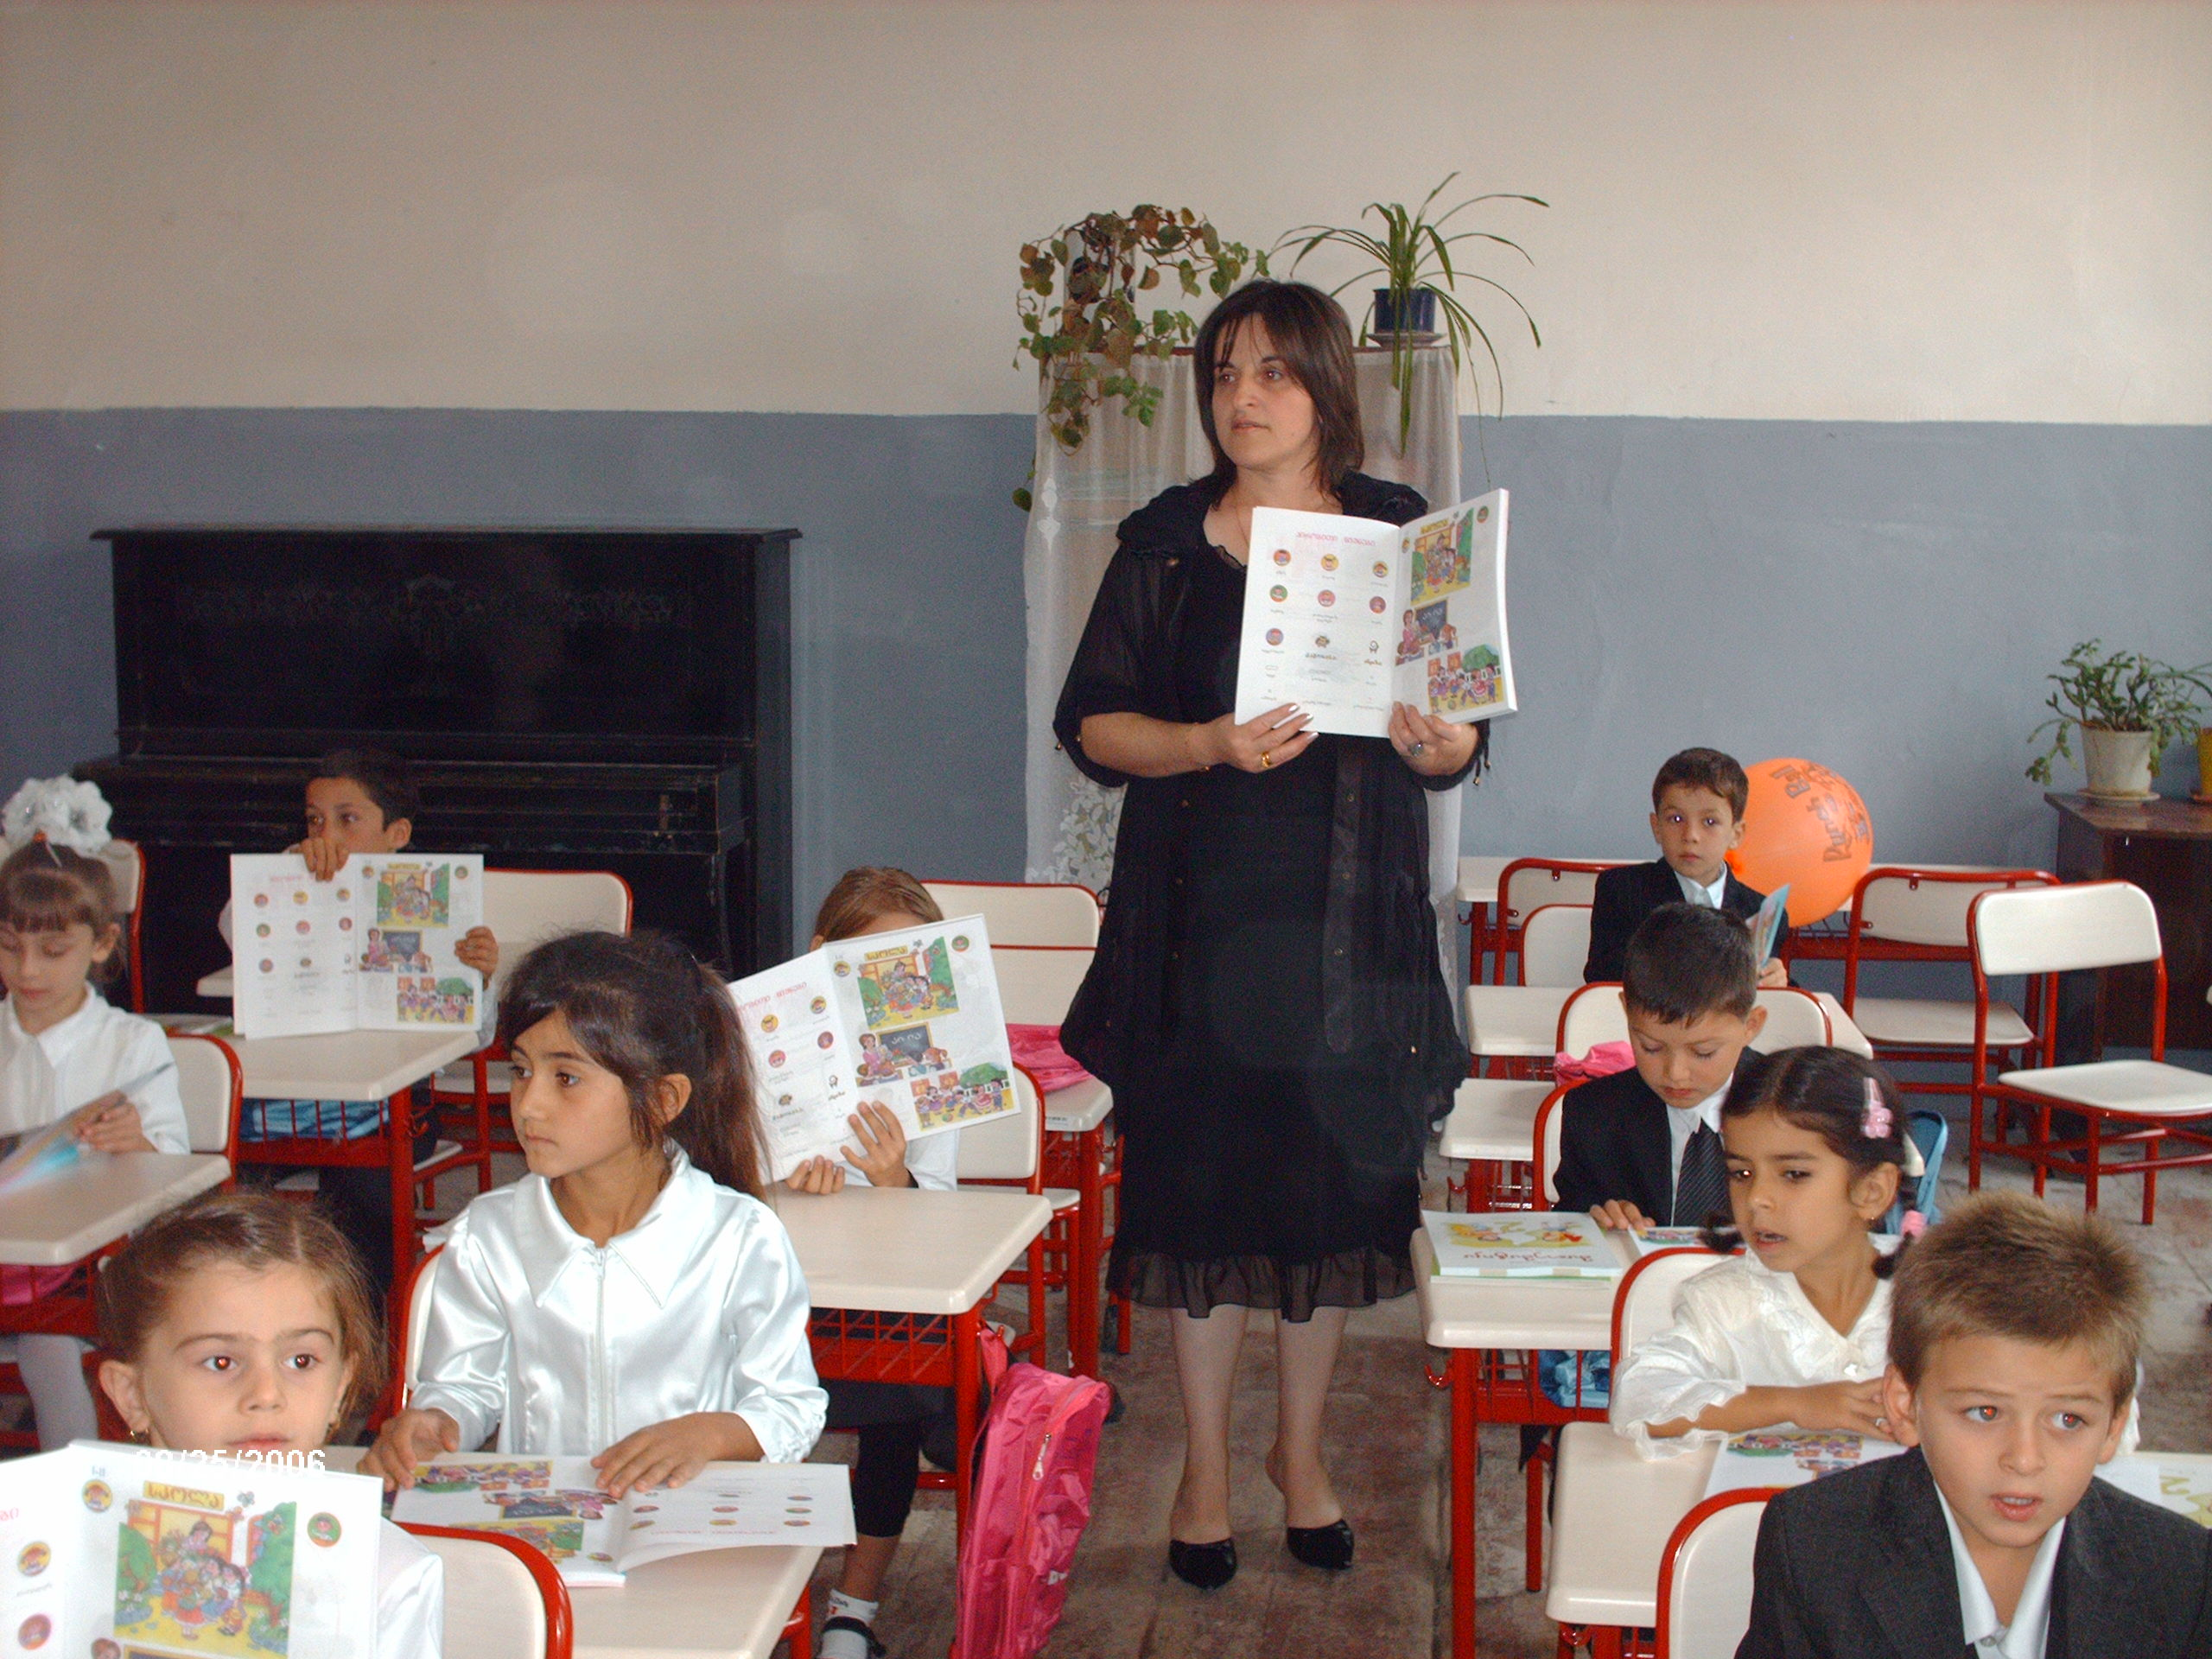 School year begins in public schools